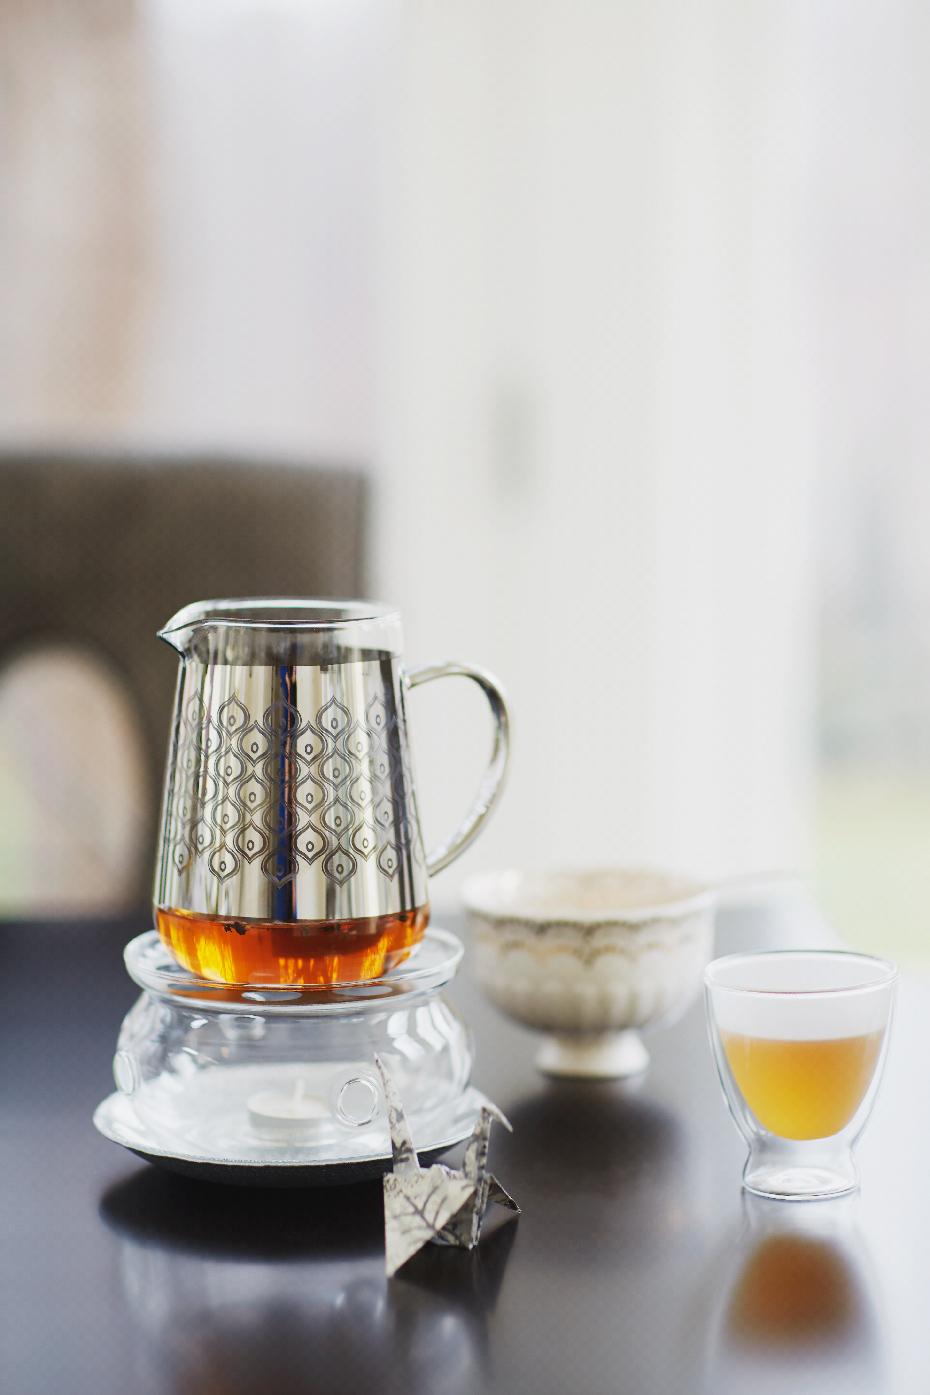 Stacey Van Berkel Photography I Ornate tea pot with tea I Bernhardt furniture